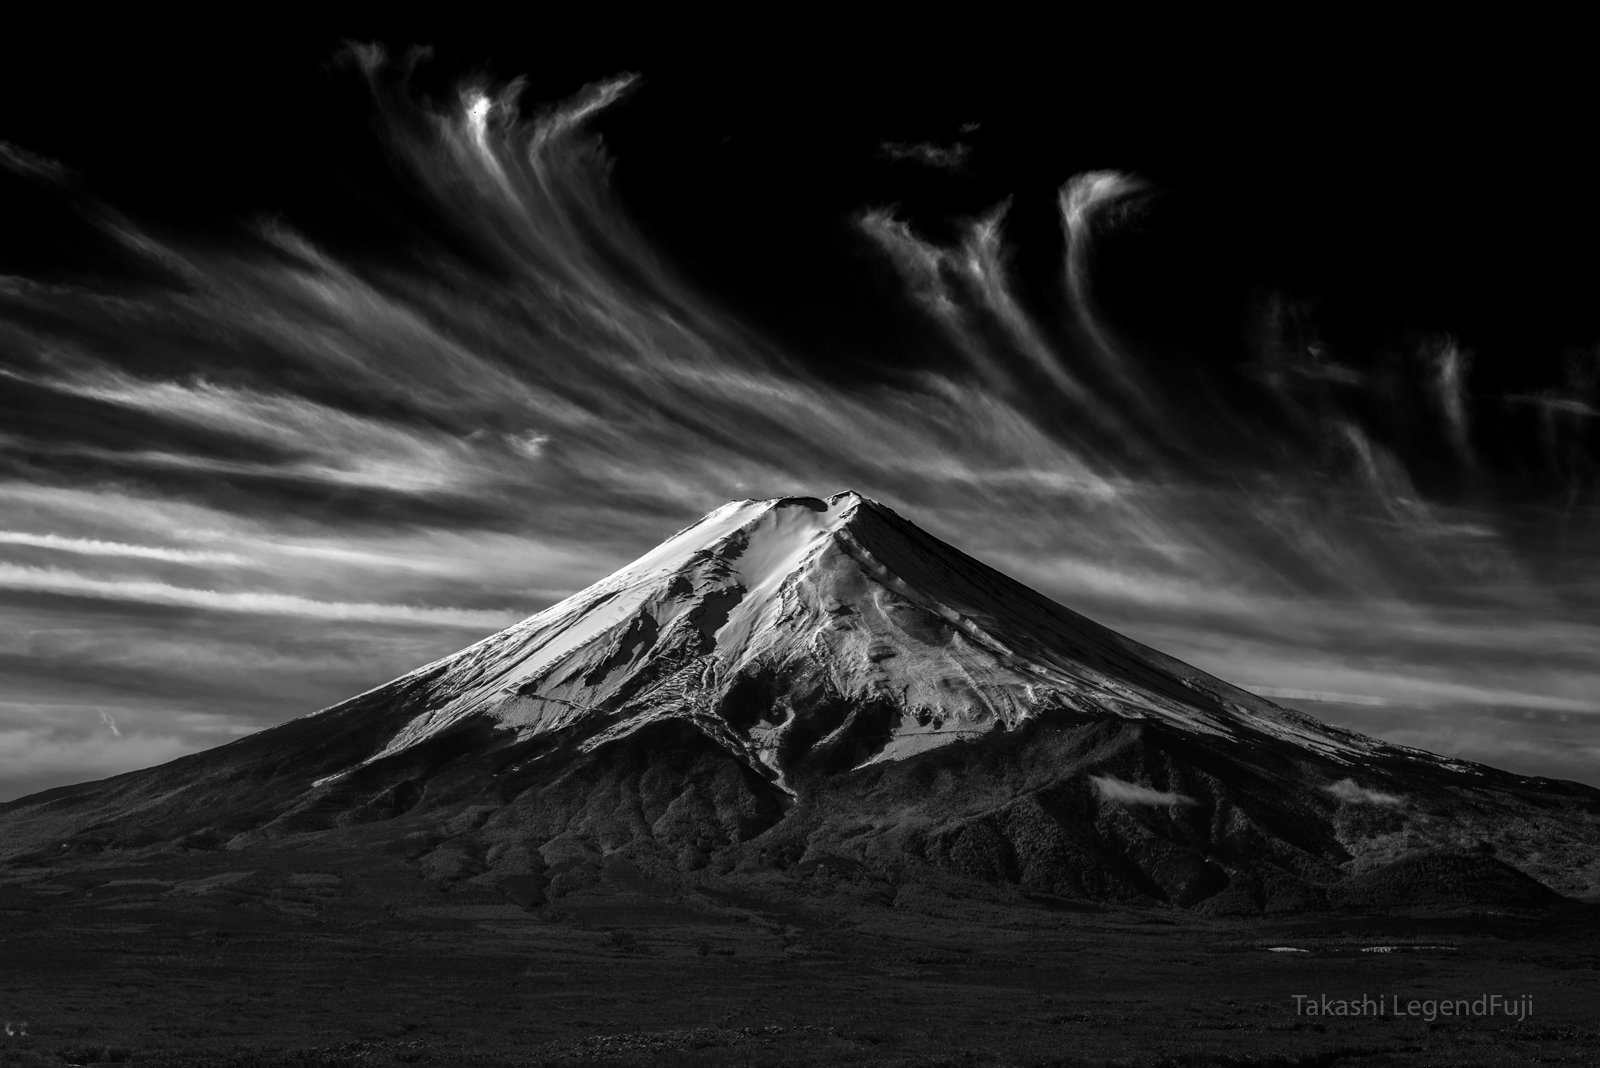 Fuji,mountain,Japan,cloud,fluff,snow,white,, Takashi